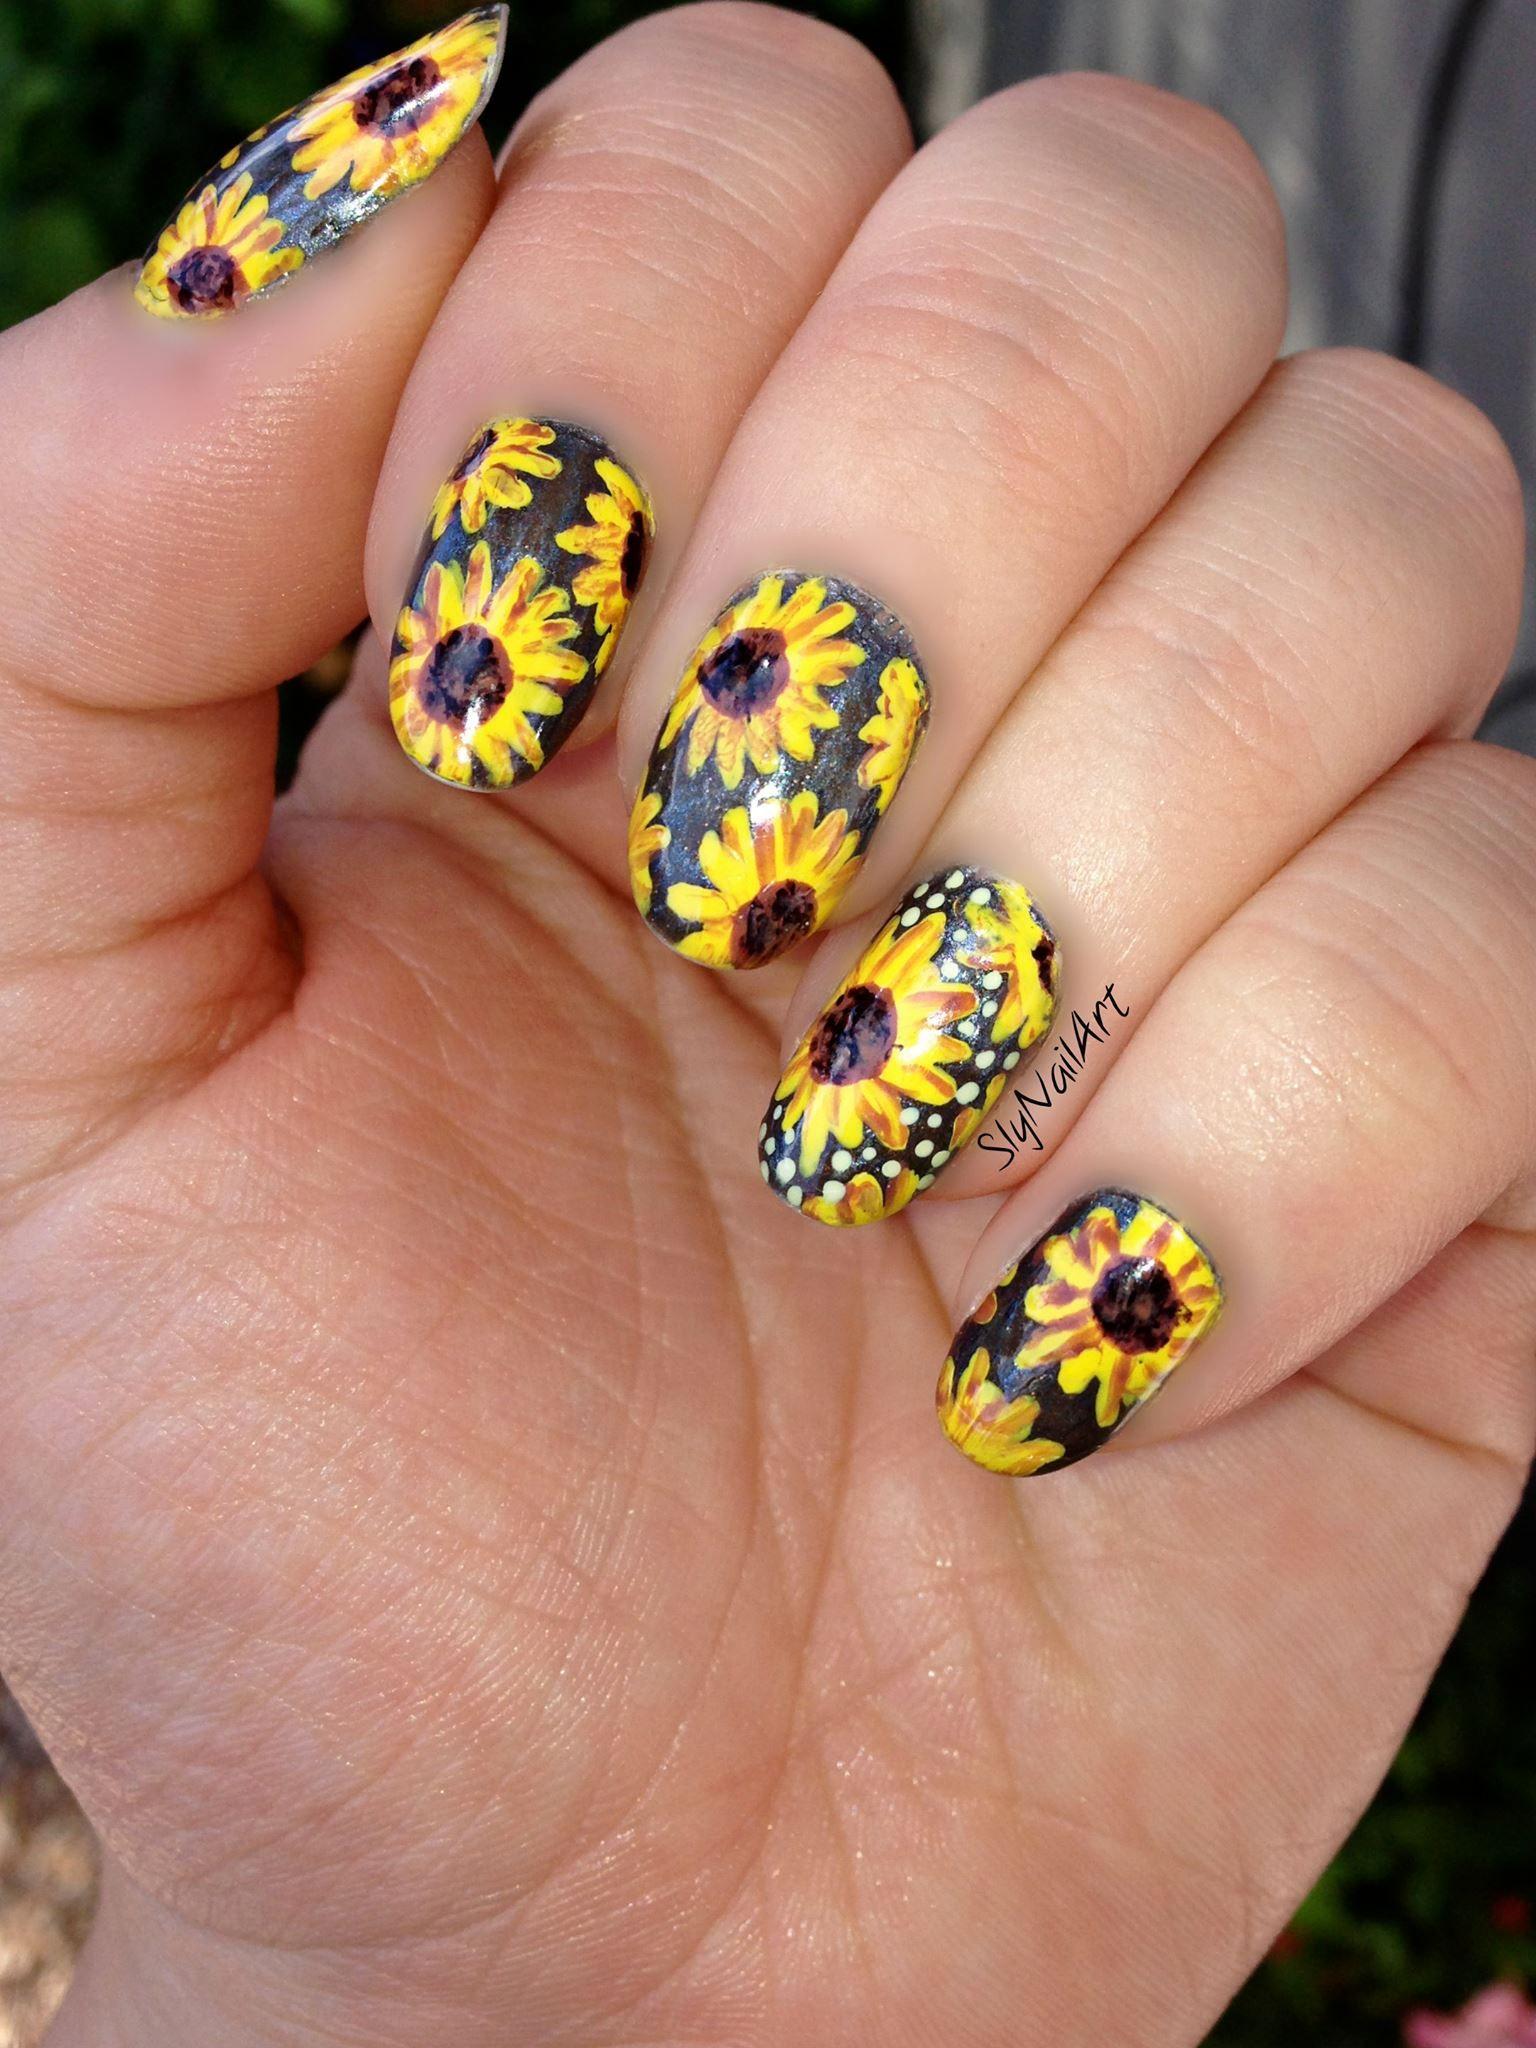 Sunflower Nail Art. -SlyNailArt - Sunflower Nail Art. -SlyNailArt Nail Art Pinterest Sunflower